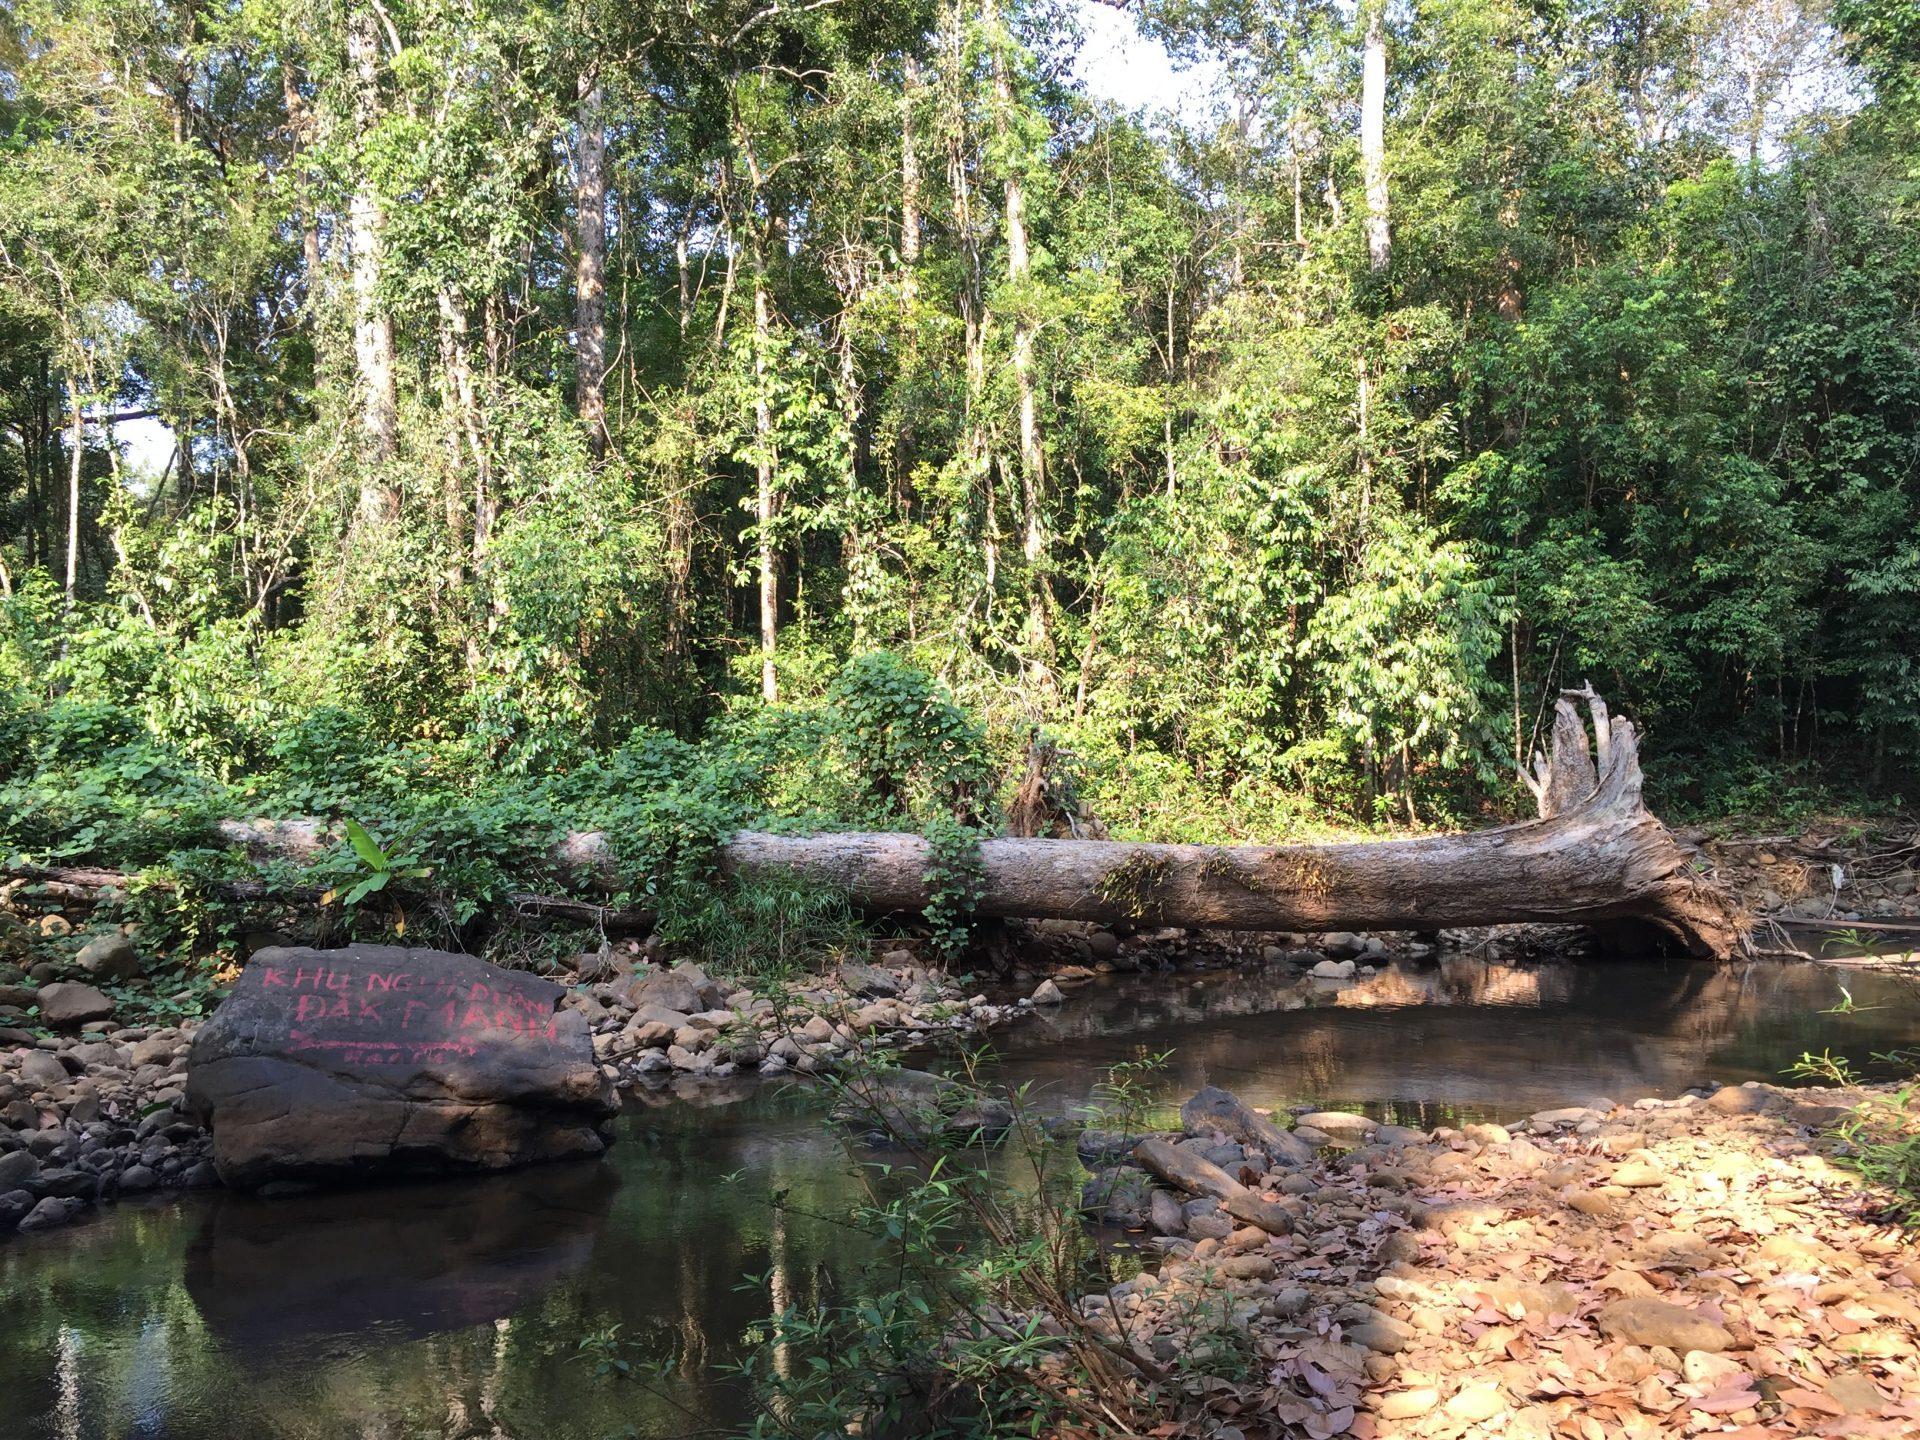 tree-stone-bugiamap-nationalpark-thebroadlife-stream-vietnam